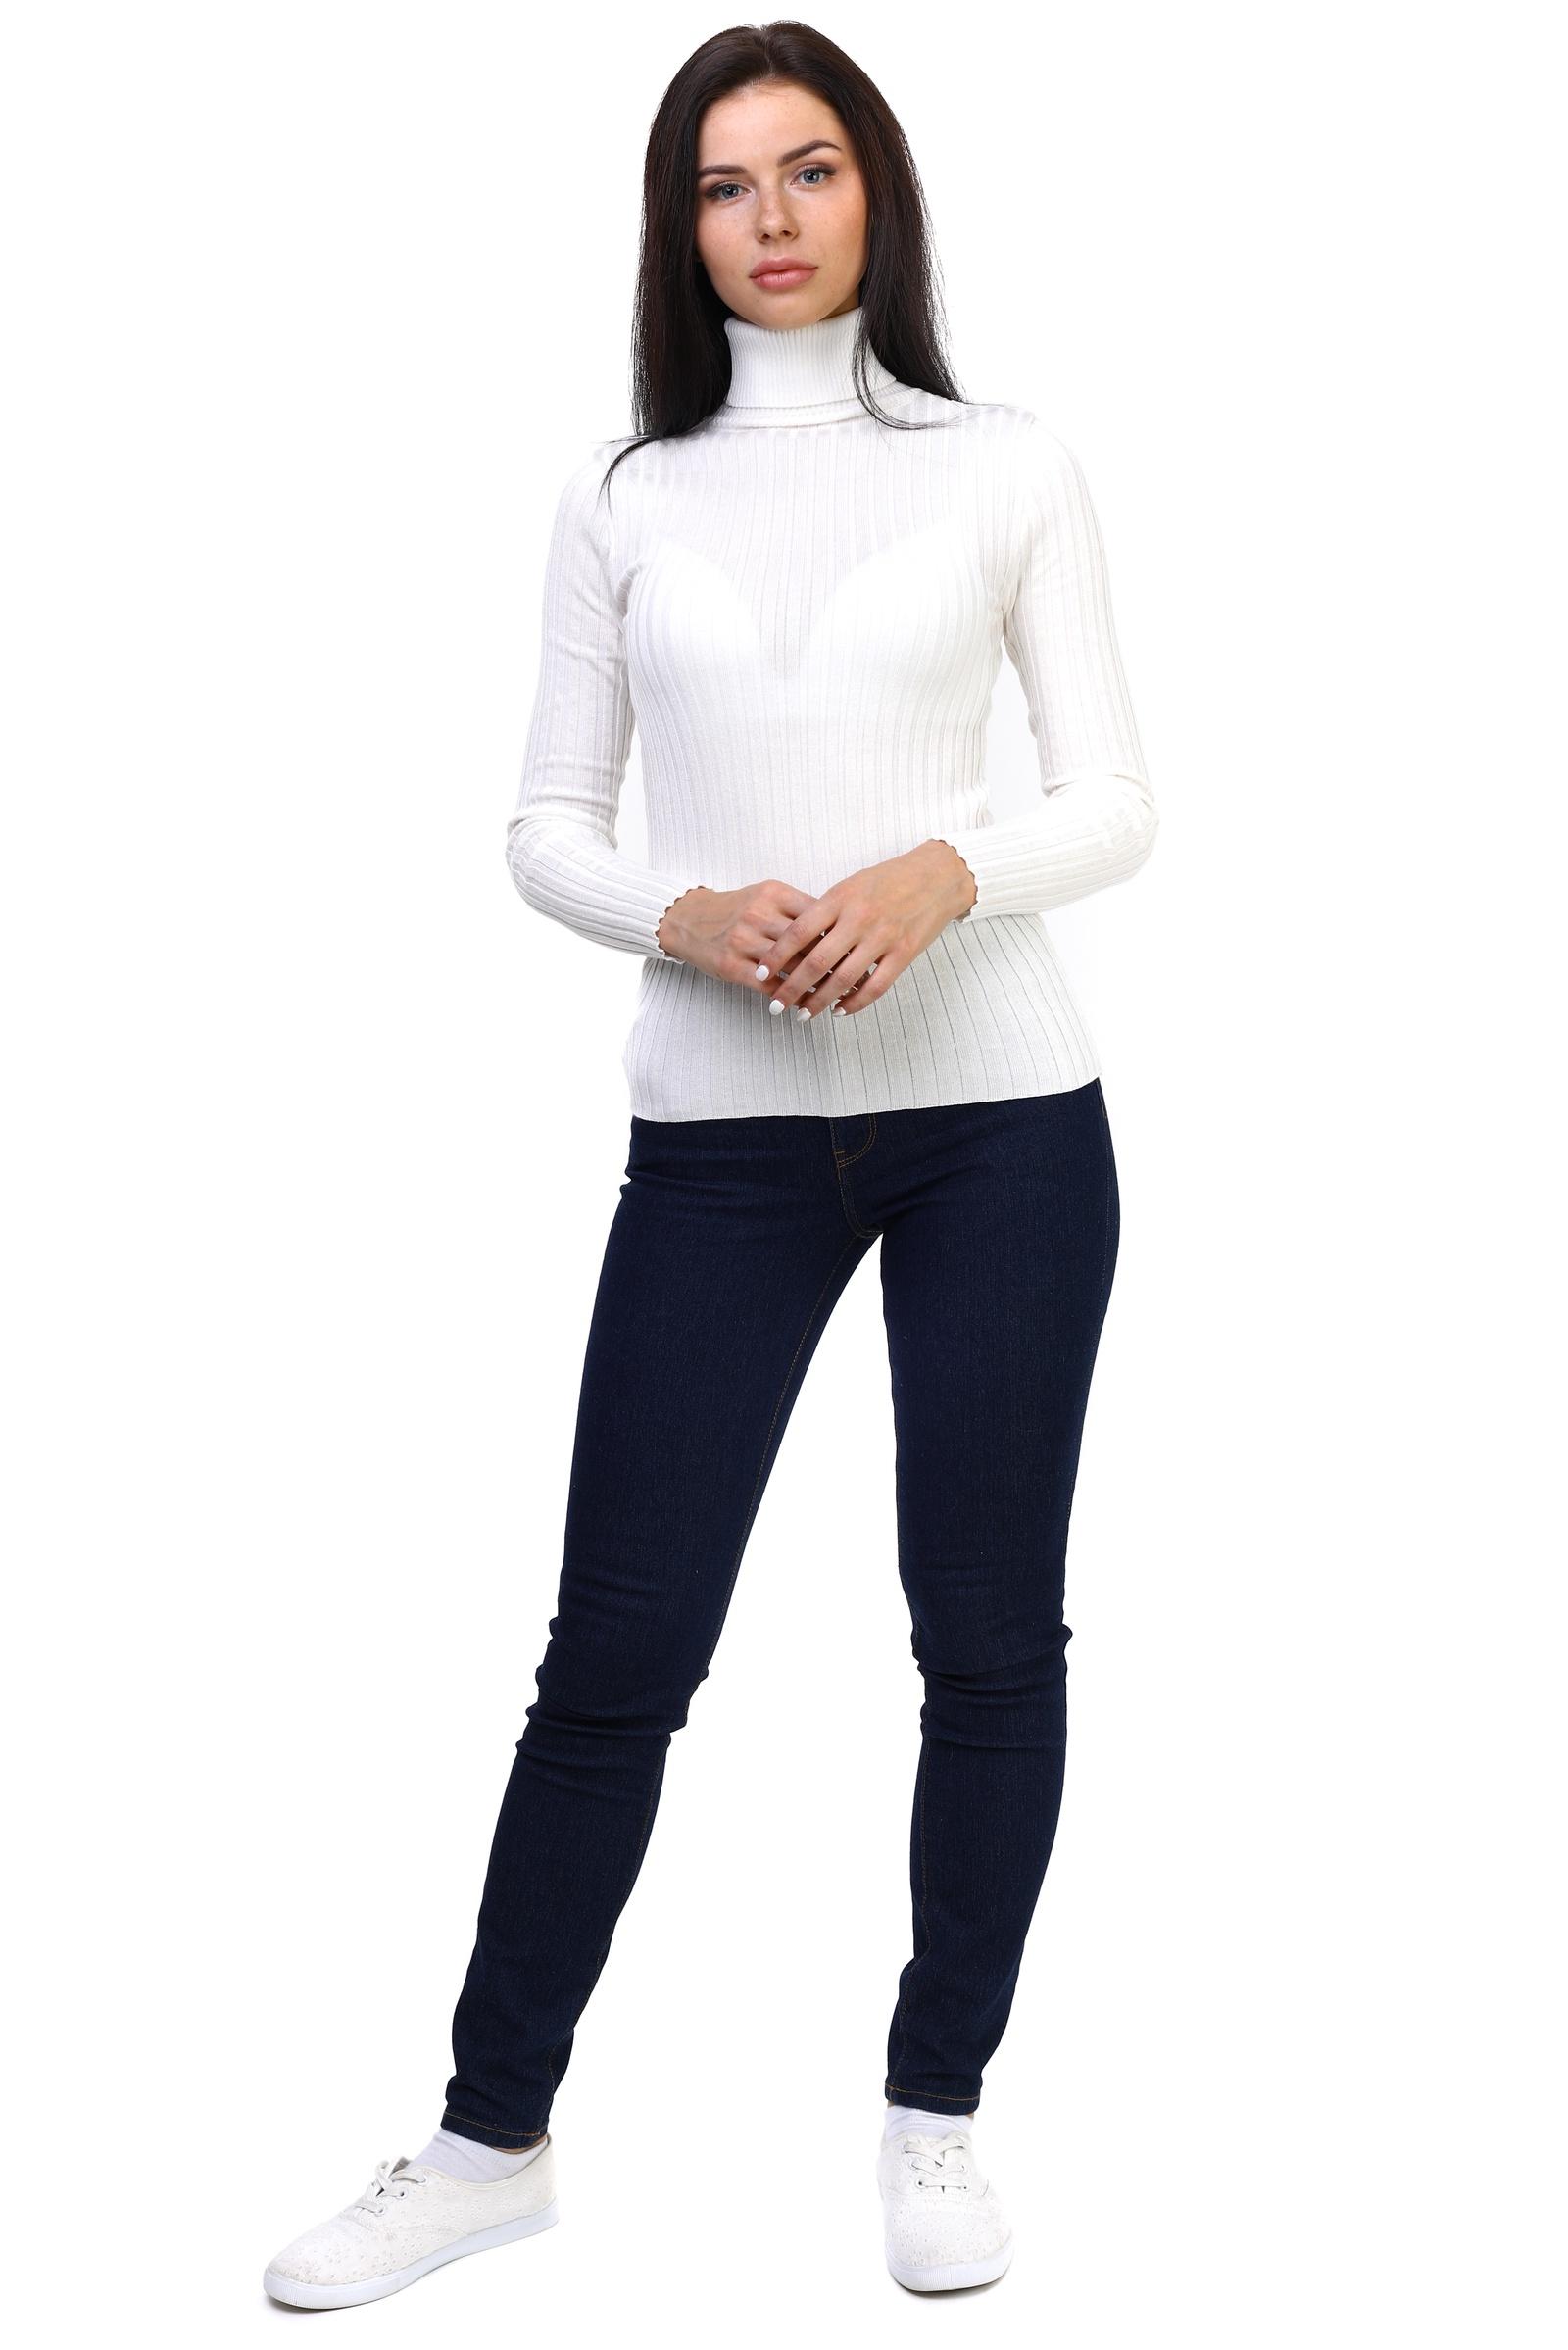 Пуловер Queen's пуловер со стоячим воротником на молнии и с пуговицами pl barkley 1